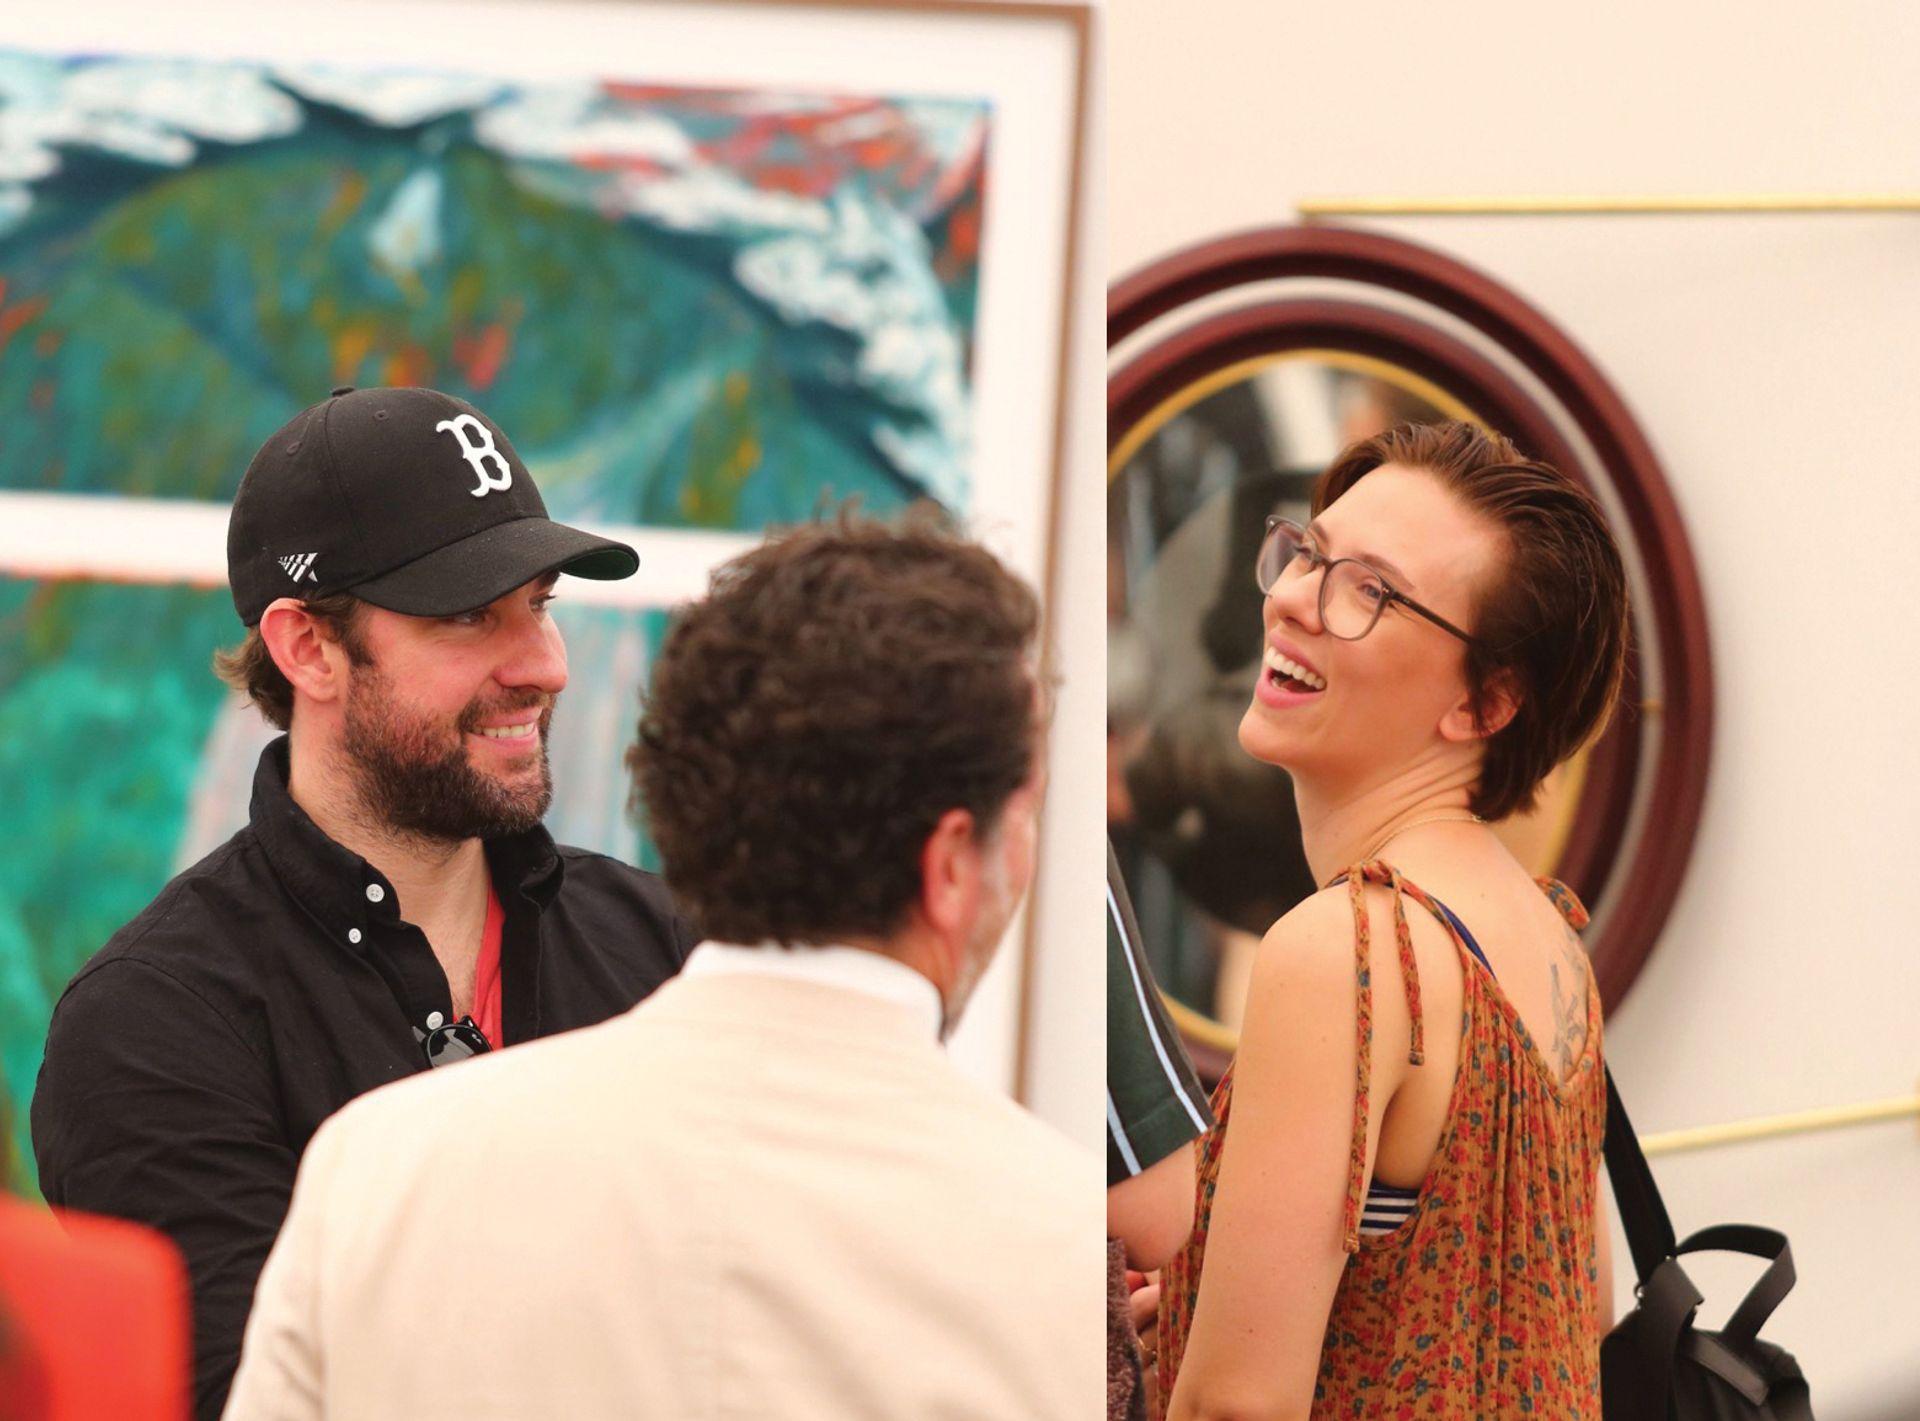 Star sightings: the actors John Krasinski and Scarlett Johansson mingled with other VIPs during Frieze's preview day Casey Fatchett